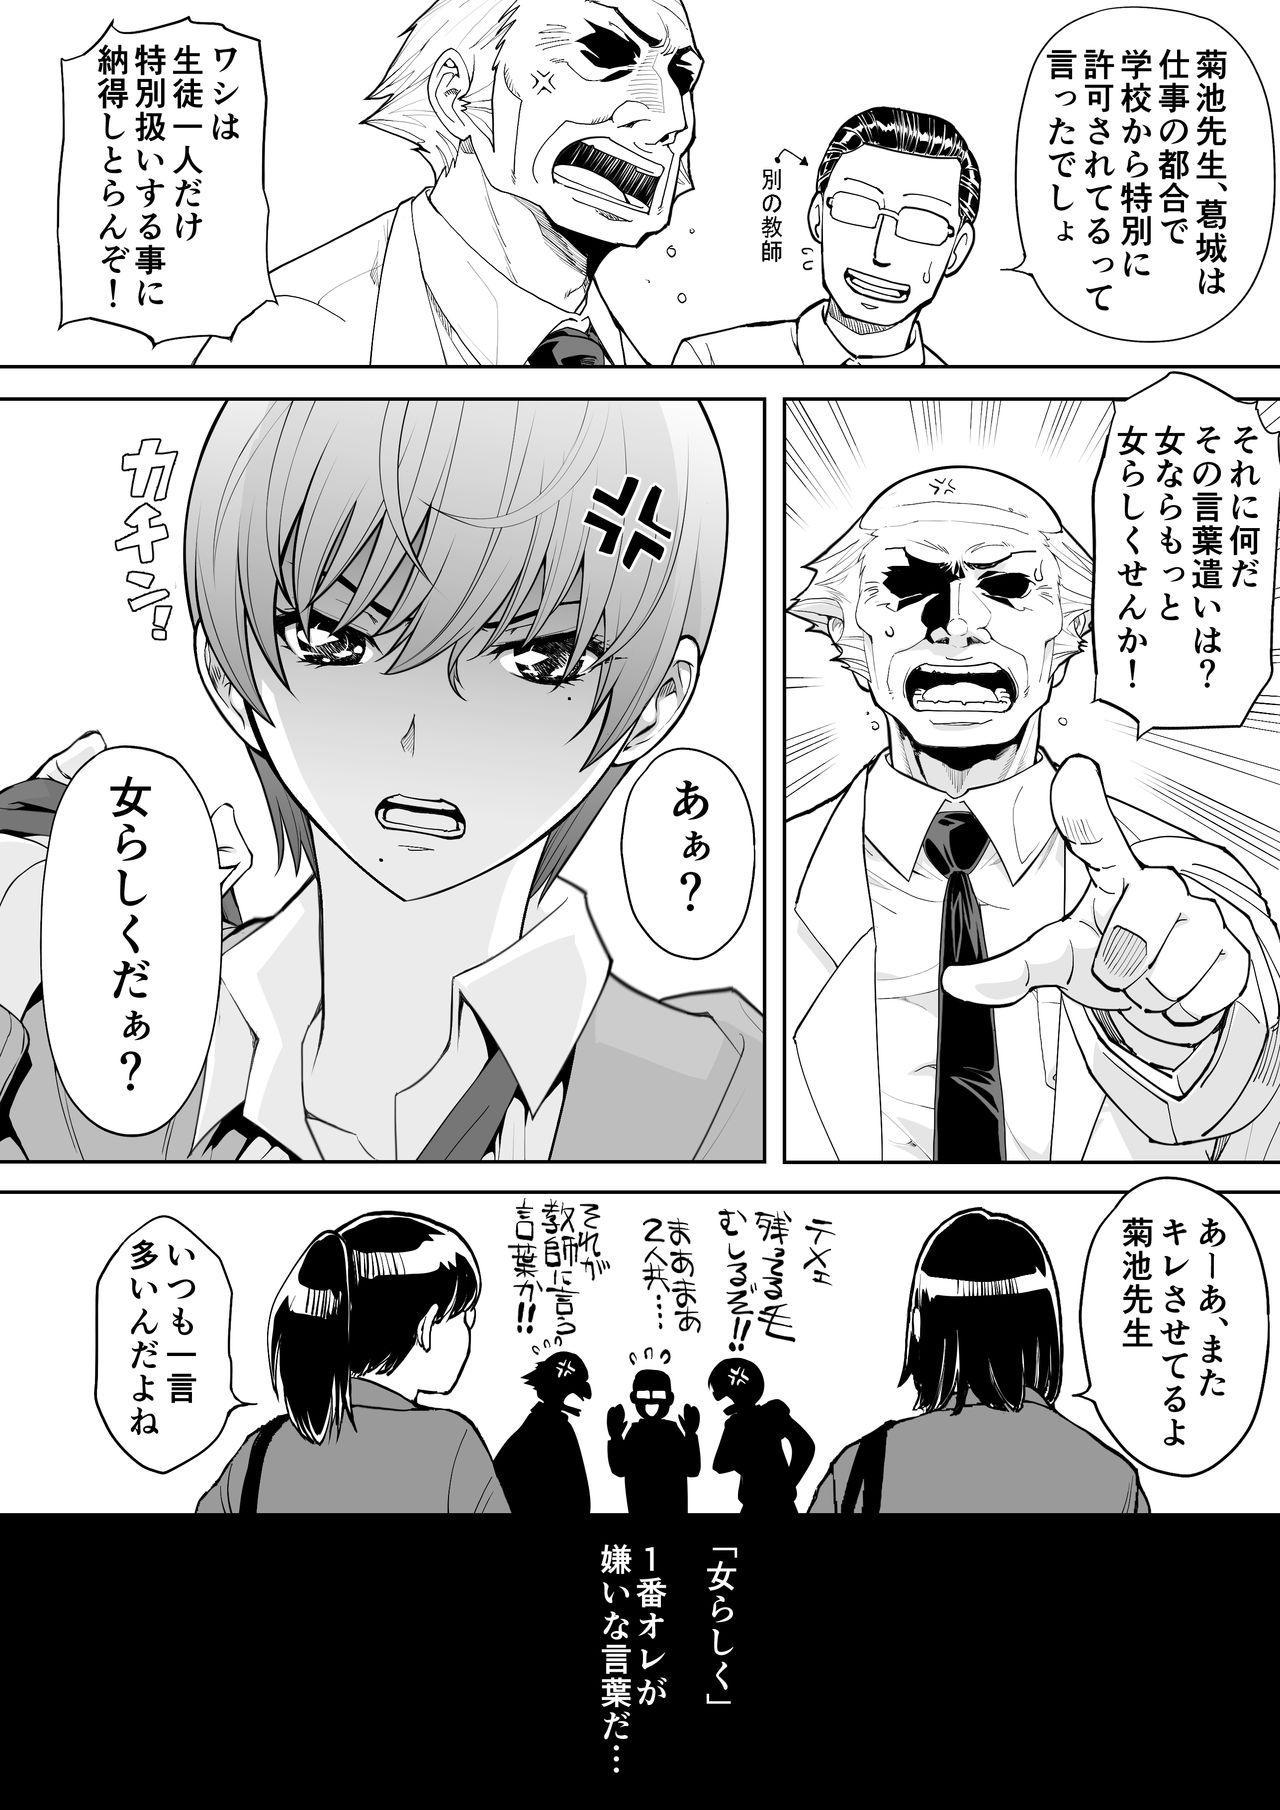 Namaiki mmusume ni tsuyo ● ikīki jugyō 5